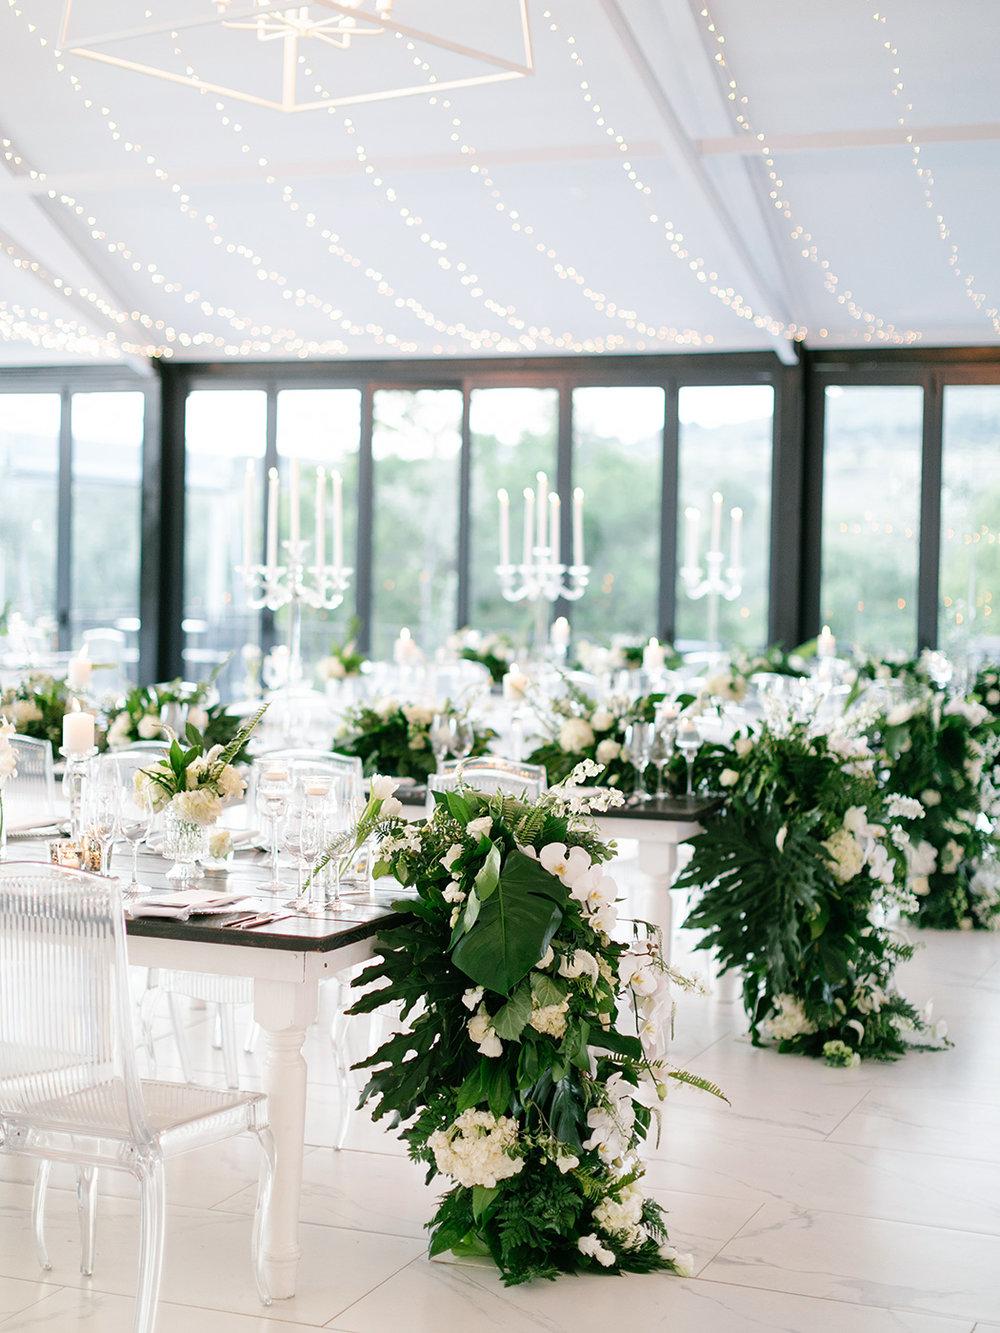 Inimitable Wedding Venue | Rensche Mari Photography